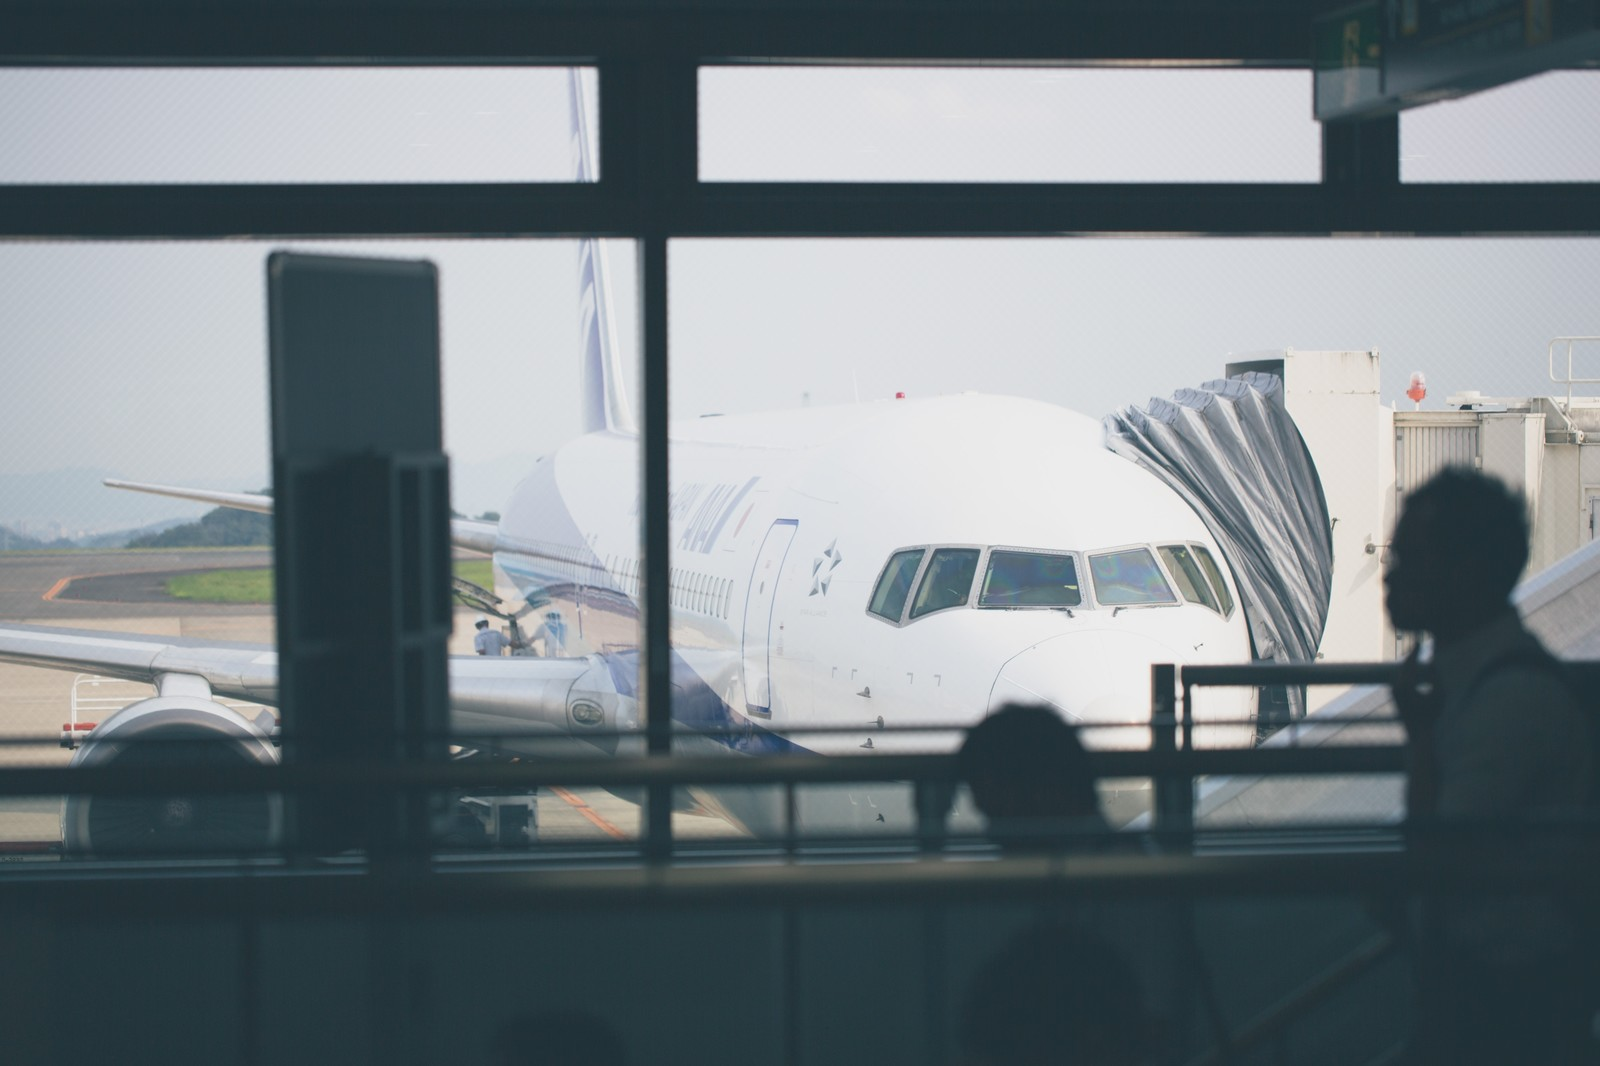 wdw旅行準備:オーランドまでの航空券について調査!(日本〜フロリダ